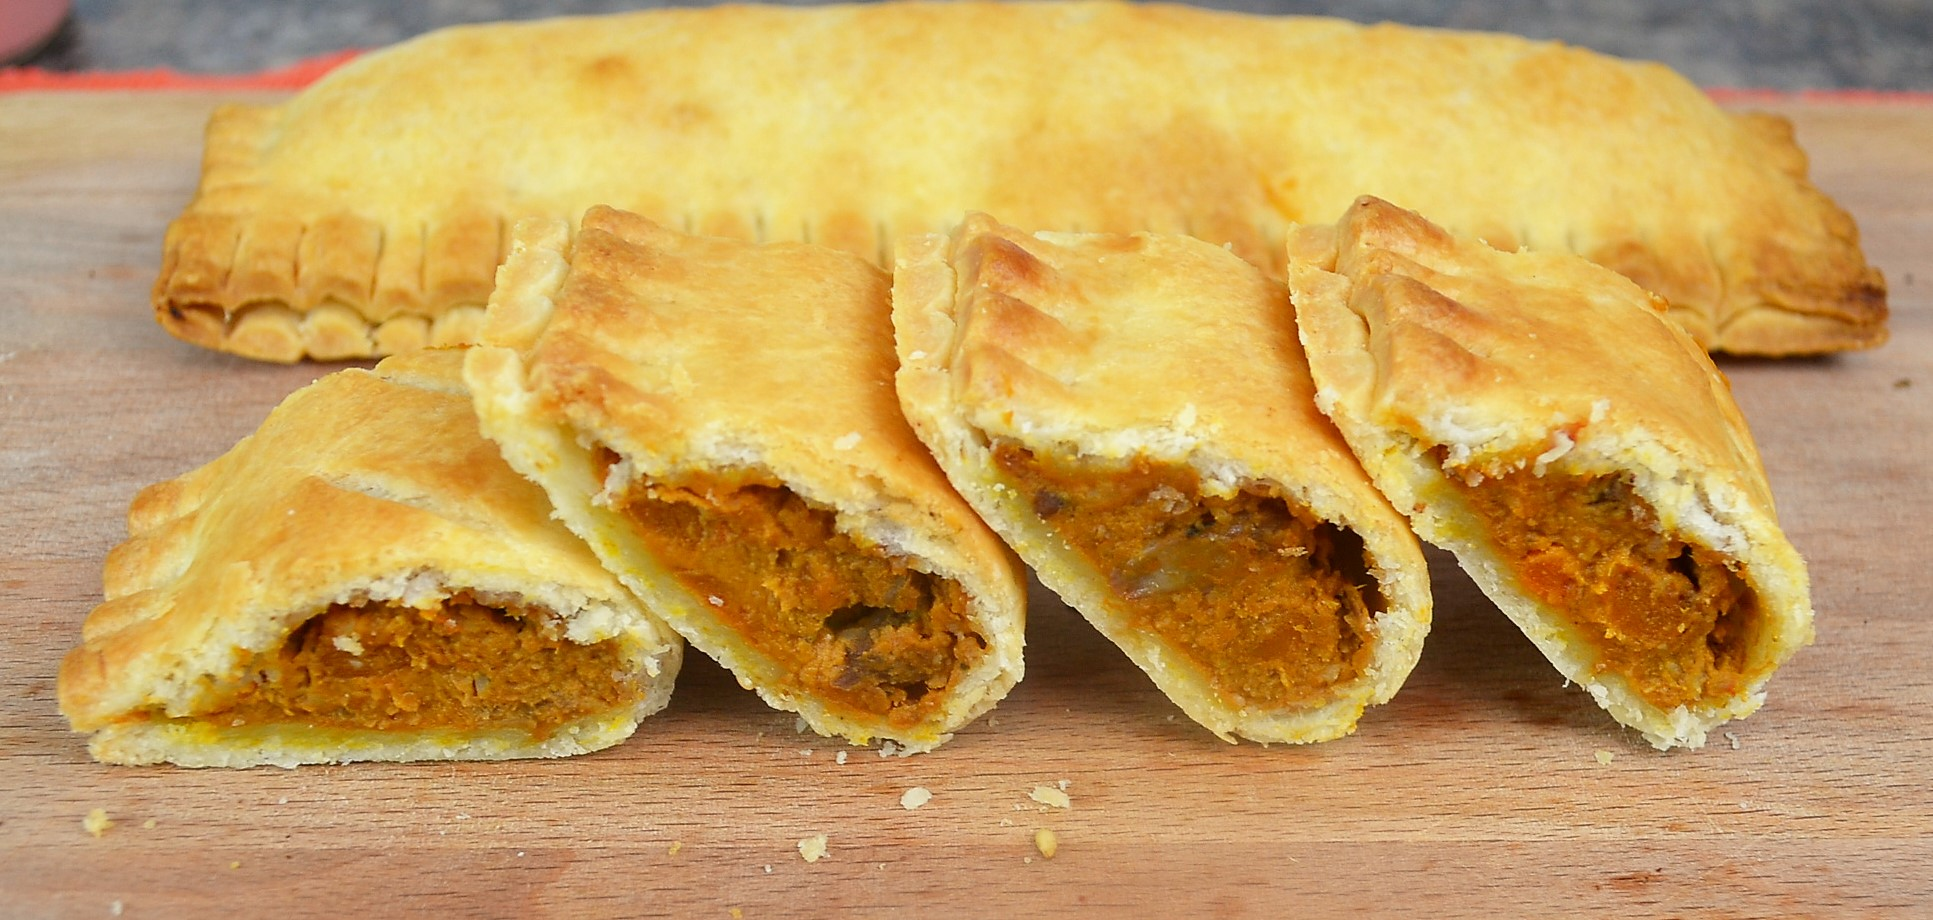 Vegetarian Snacks Butternut Squash, Blue Cheese and Walnut Pastries Recipe dontask4salt